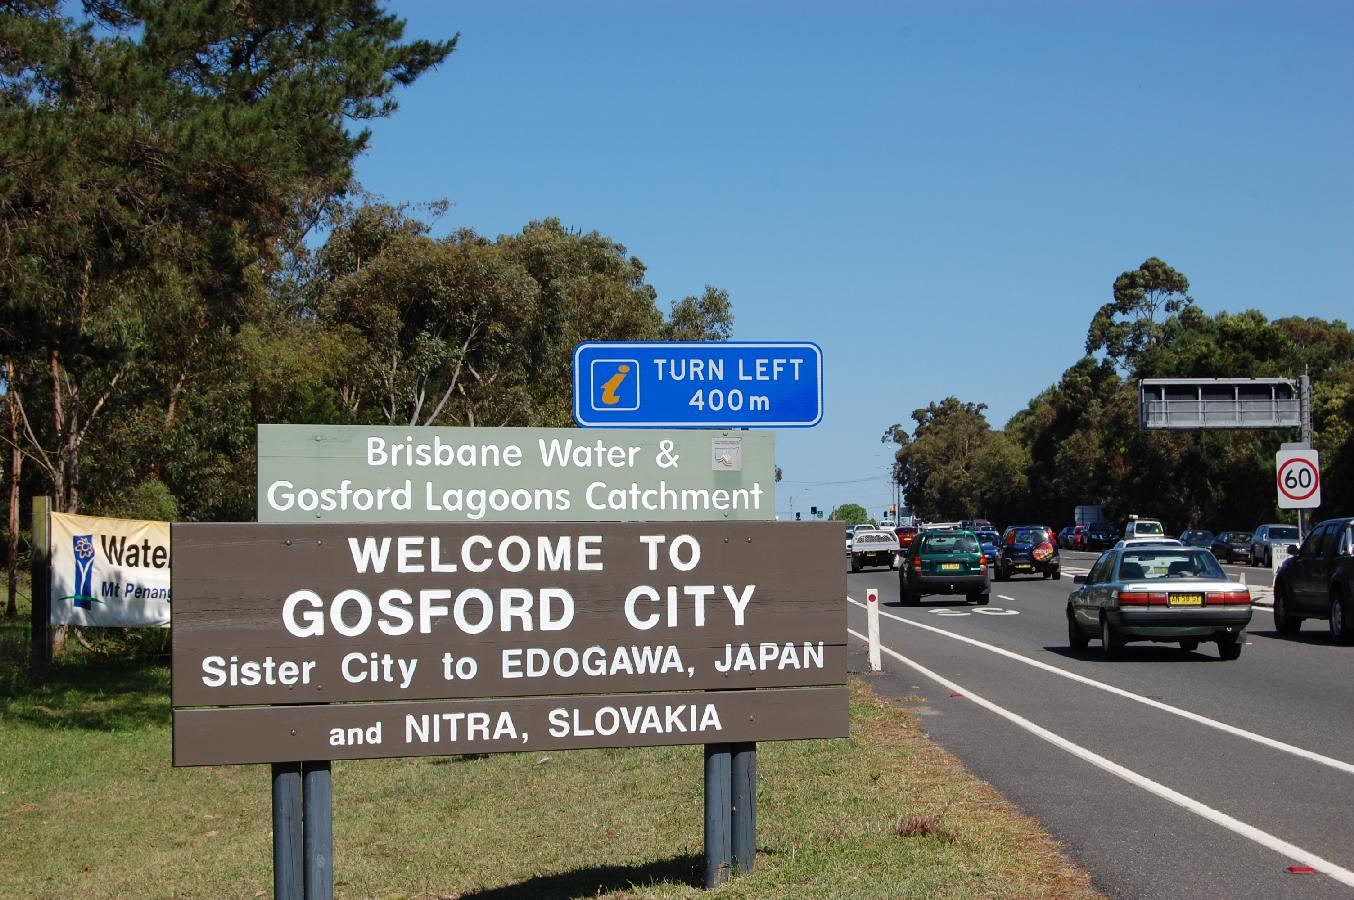 Zadarmo Zoznamka South Wales